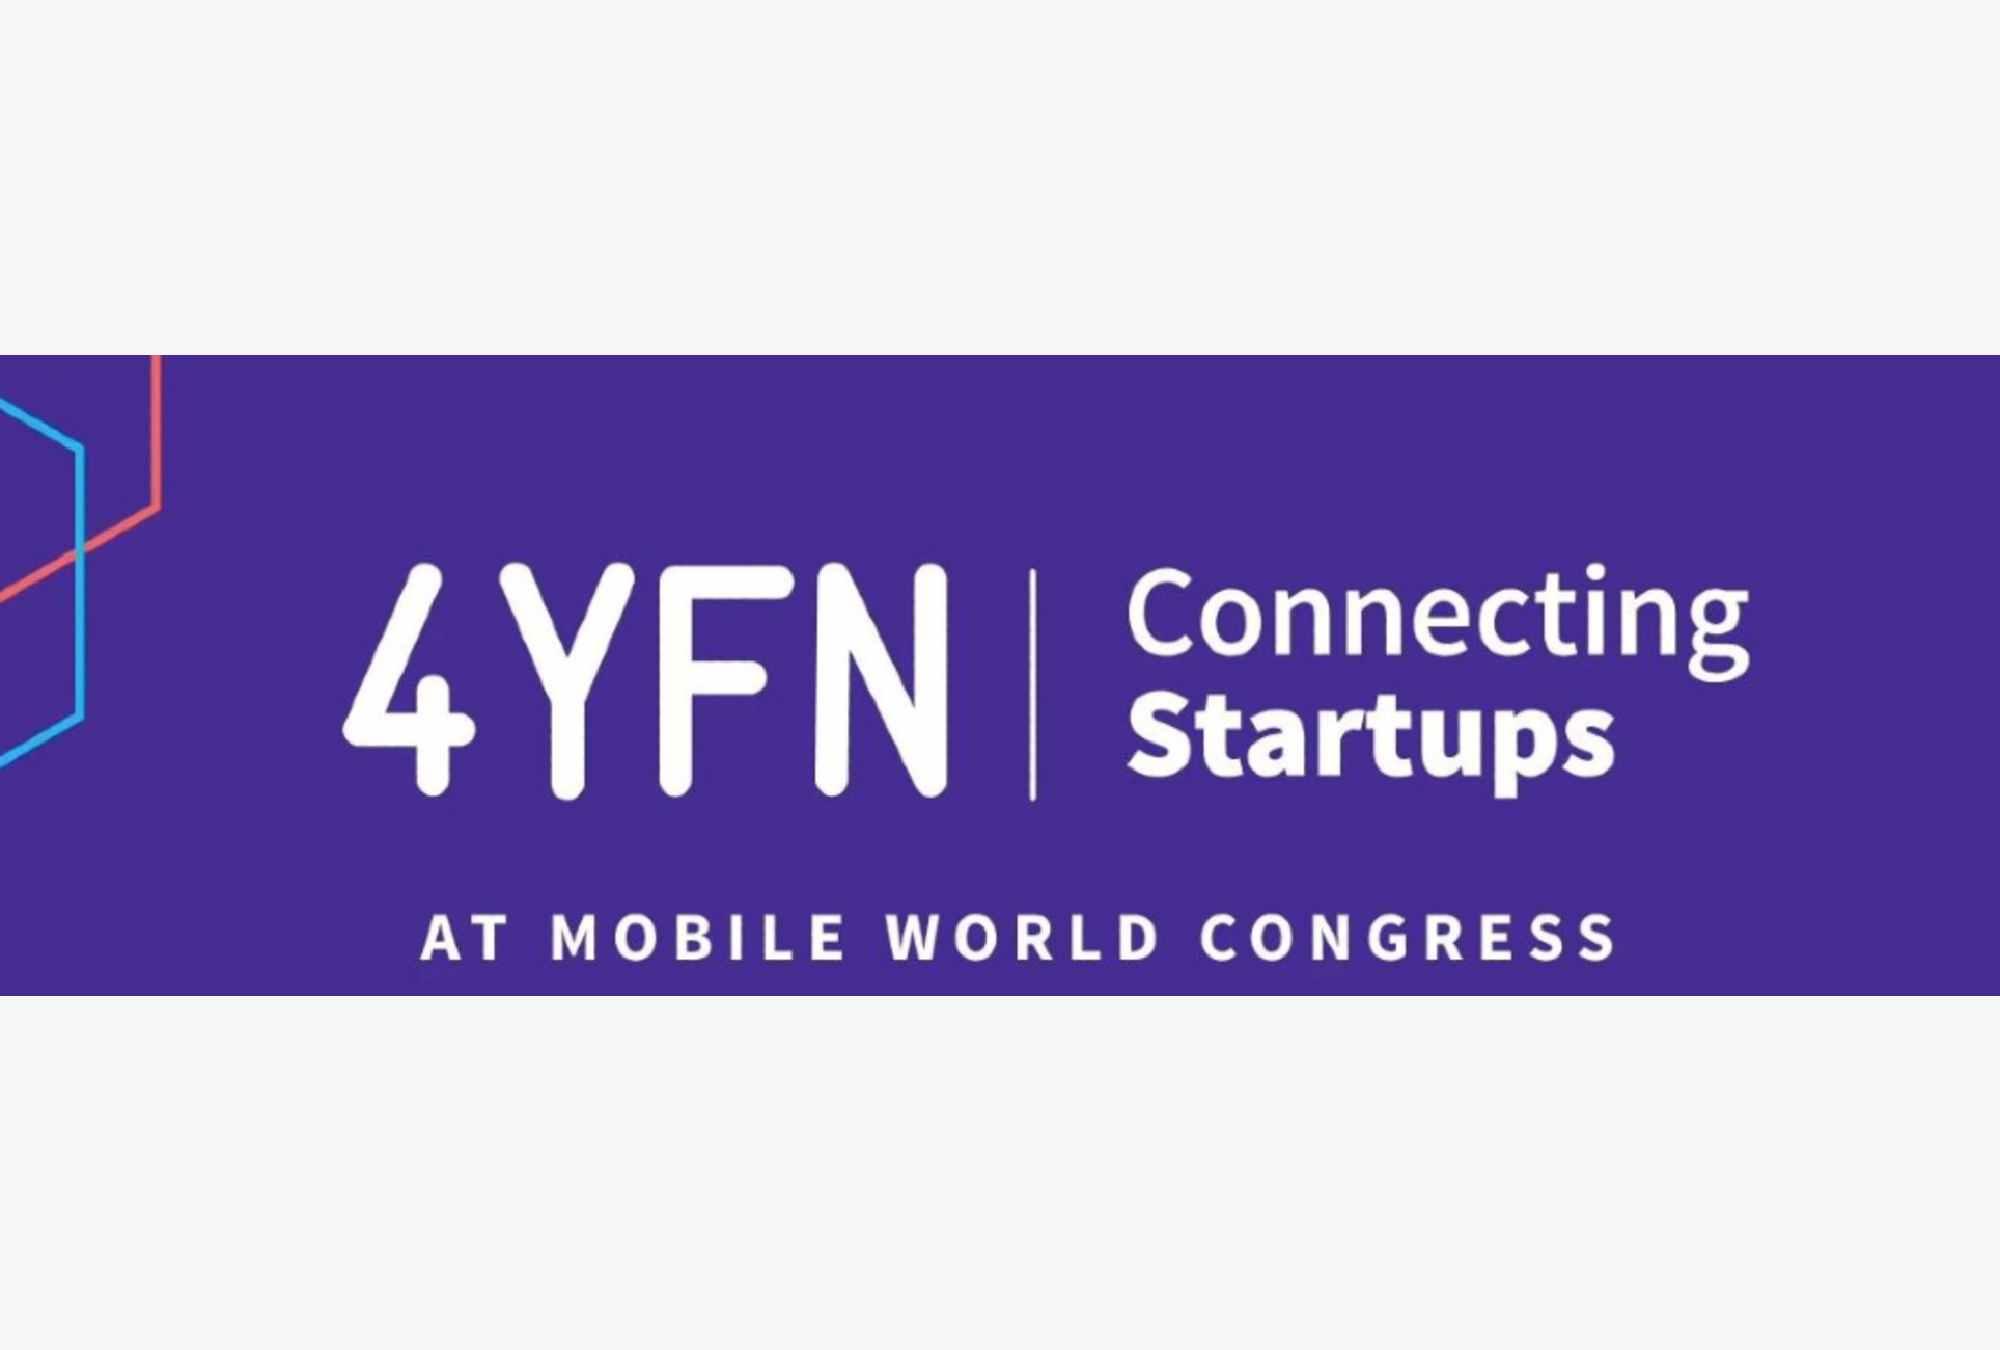 4YFN logo